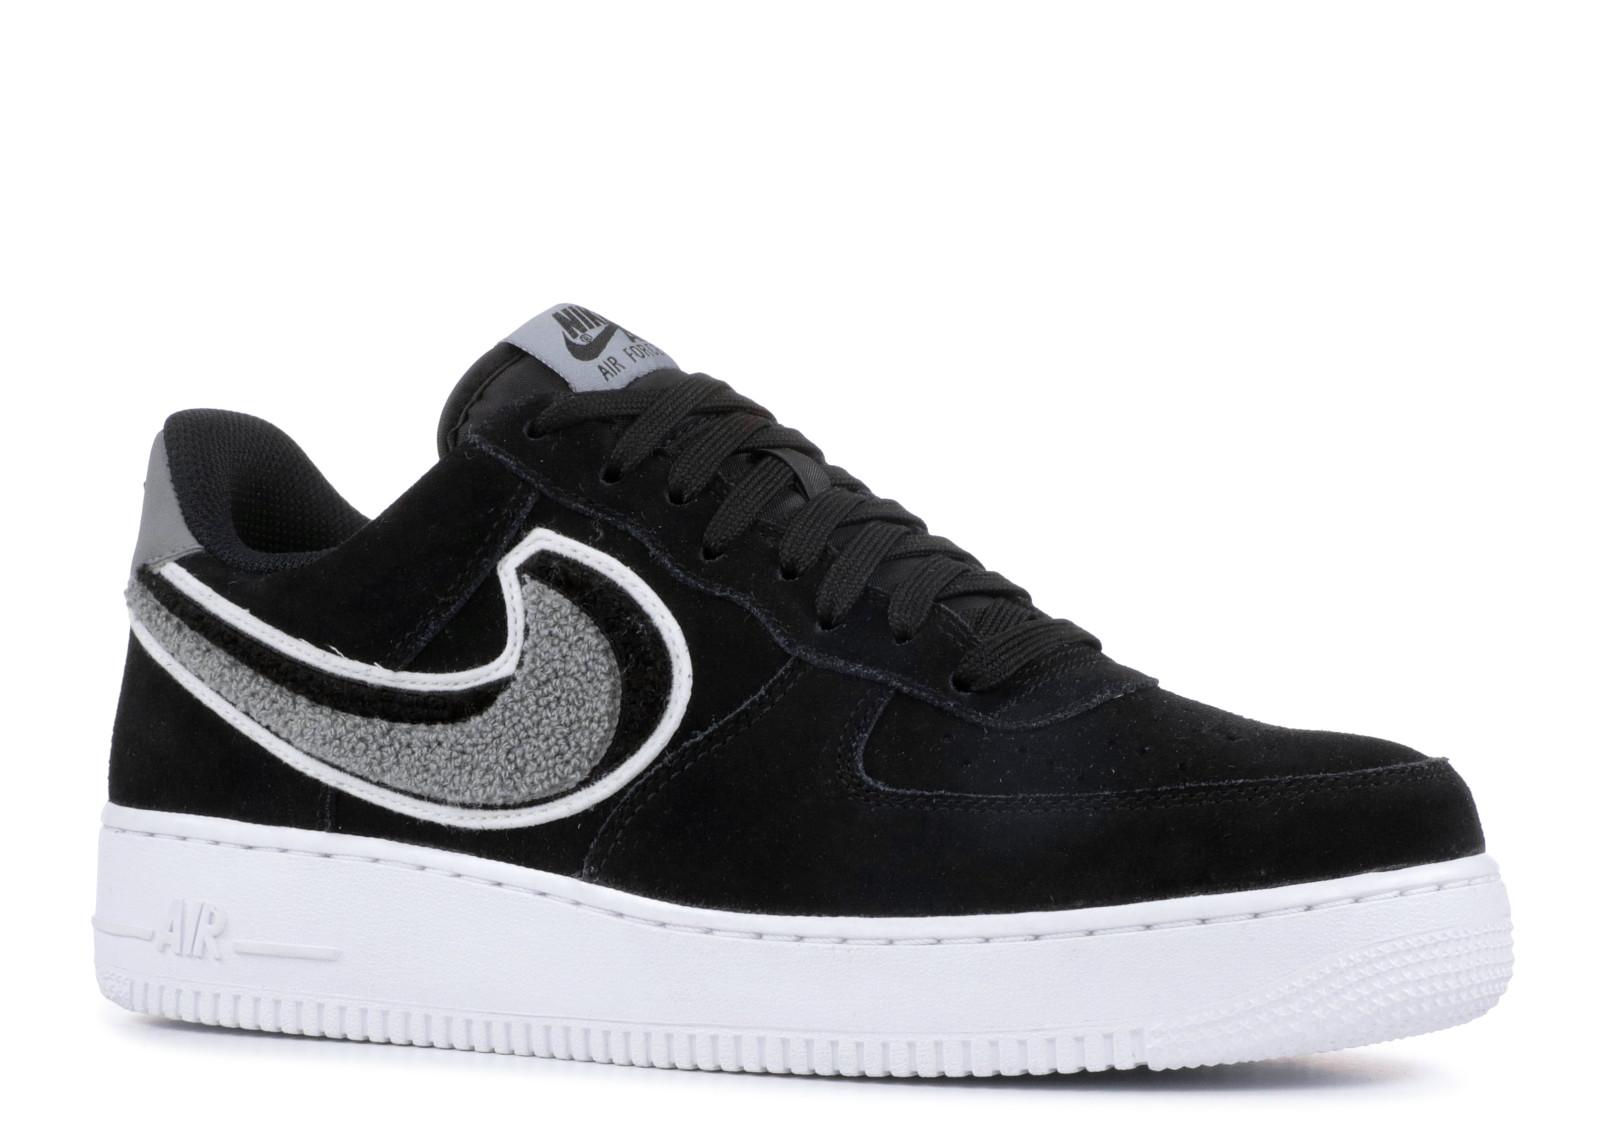 5e9cf2a9e9 Nike Air Force 1 Low 3D Chenille Swoosh Black Cool Grey - 1